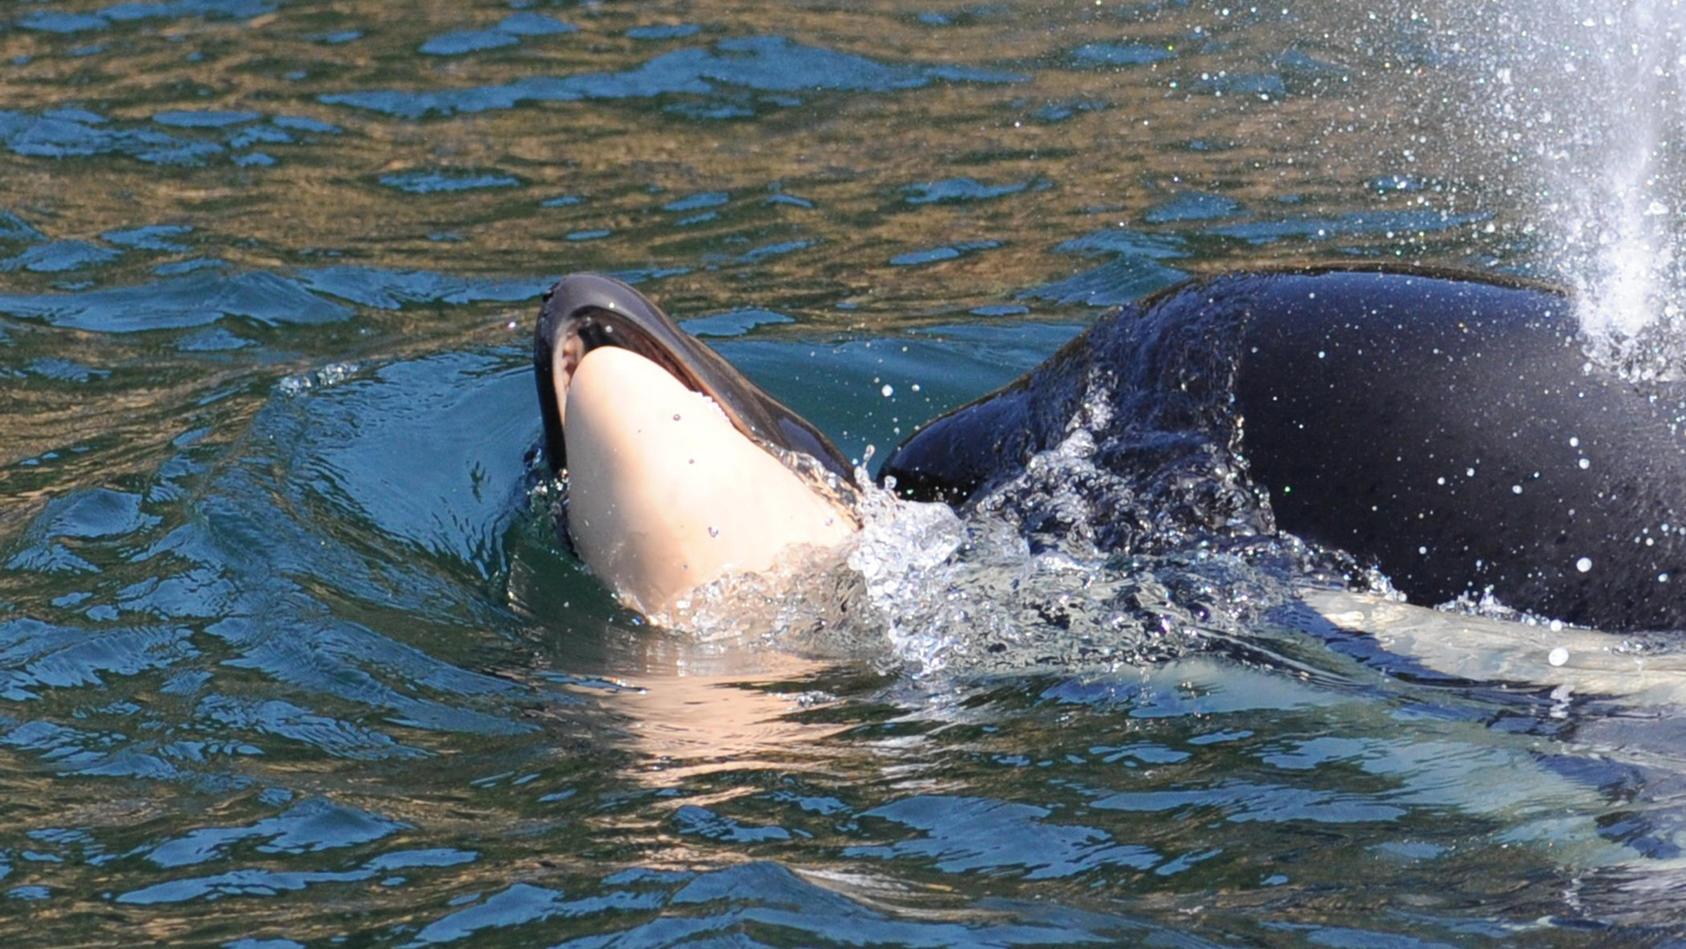 Orca-Wal Tahlequah schleppt ihr totes Junges.